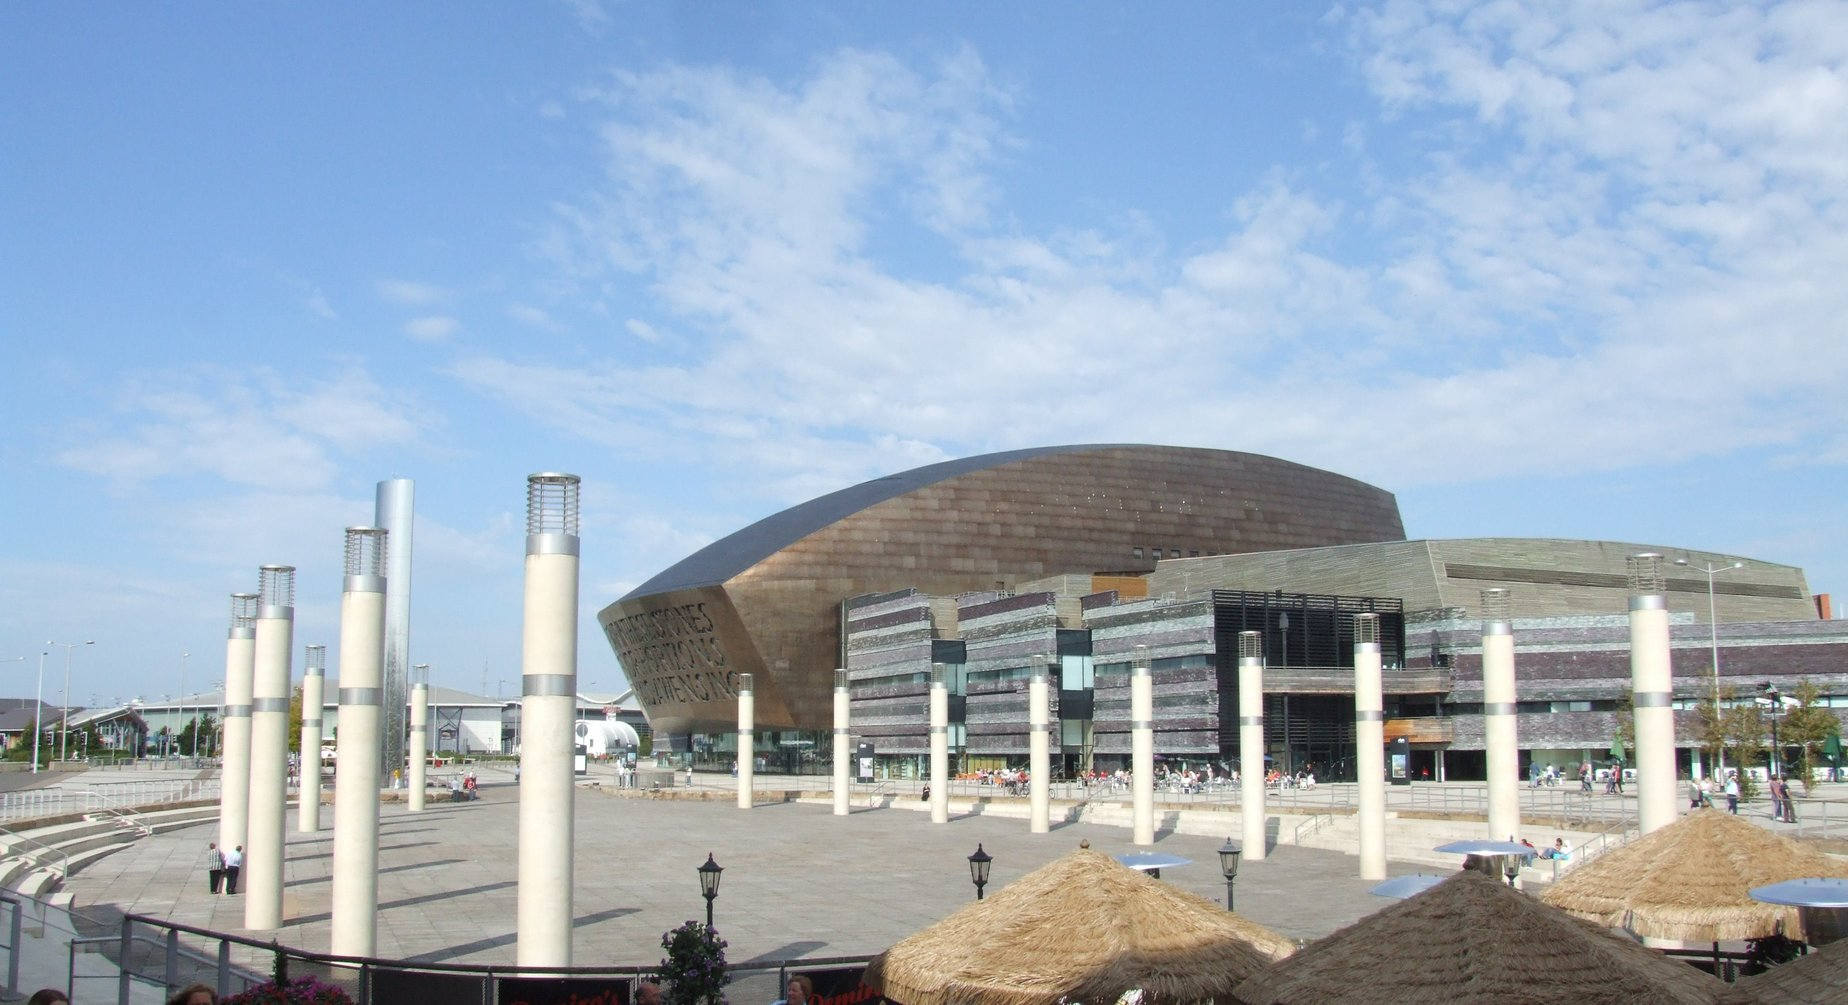 Roald Dahl Plass, Cardiff